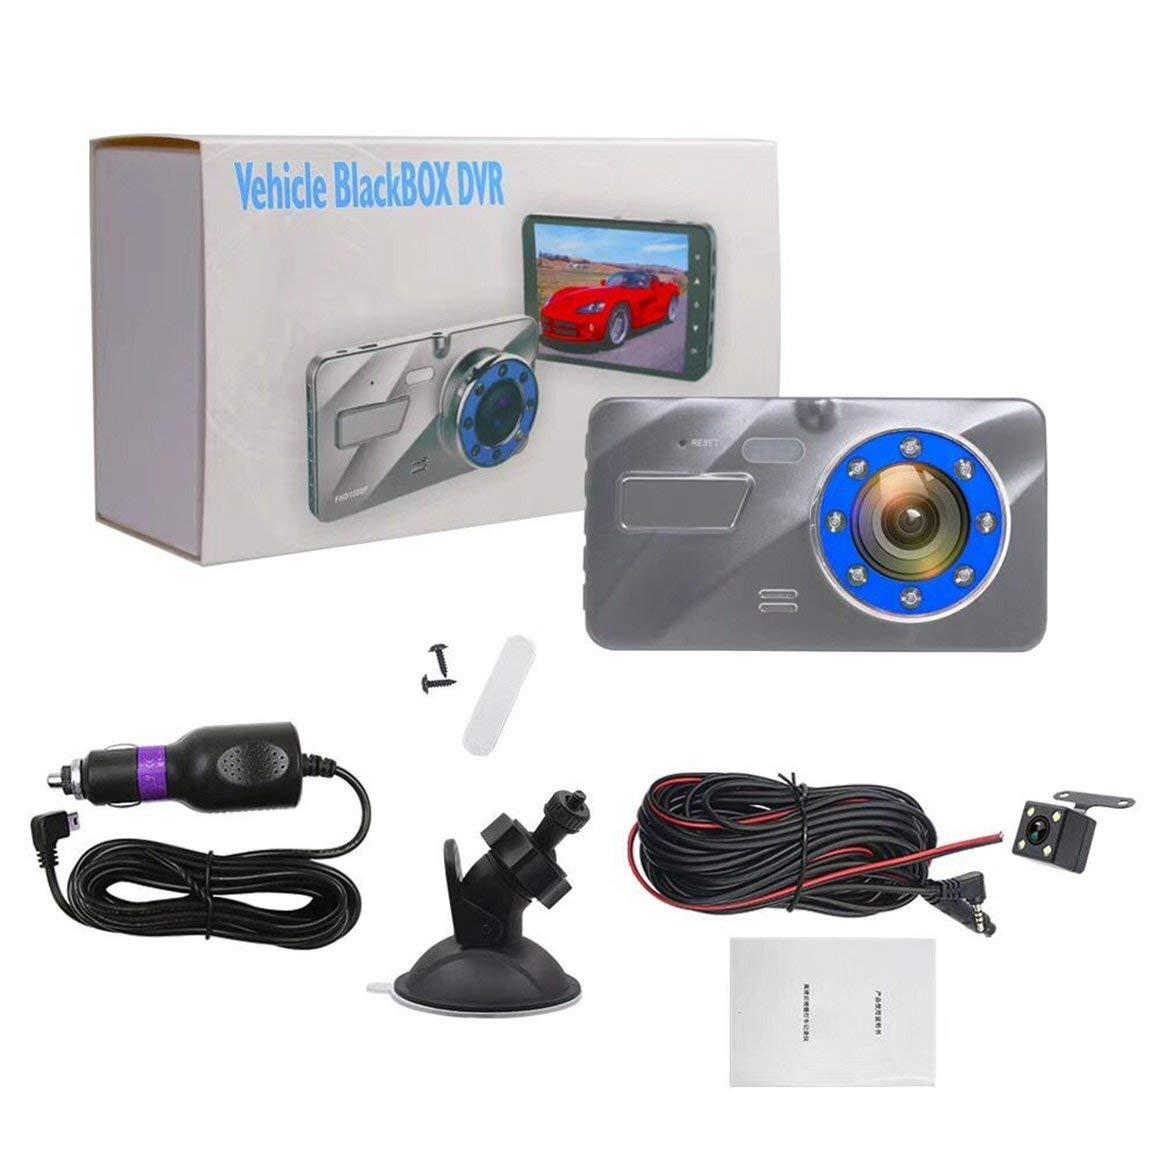 Funnyrunstore HD 170 Degree Rotary Traffic Recorder 1080P Detección de Velocidad Fija High Clarity Mirror Multi Direction Recording (Negro)